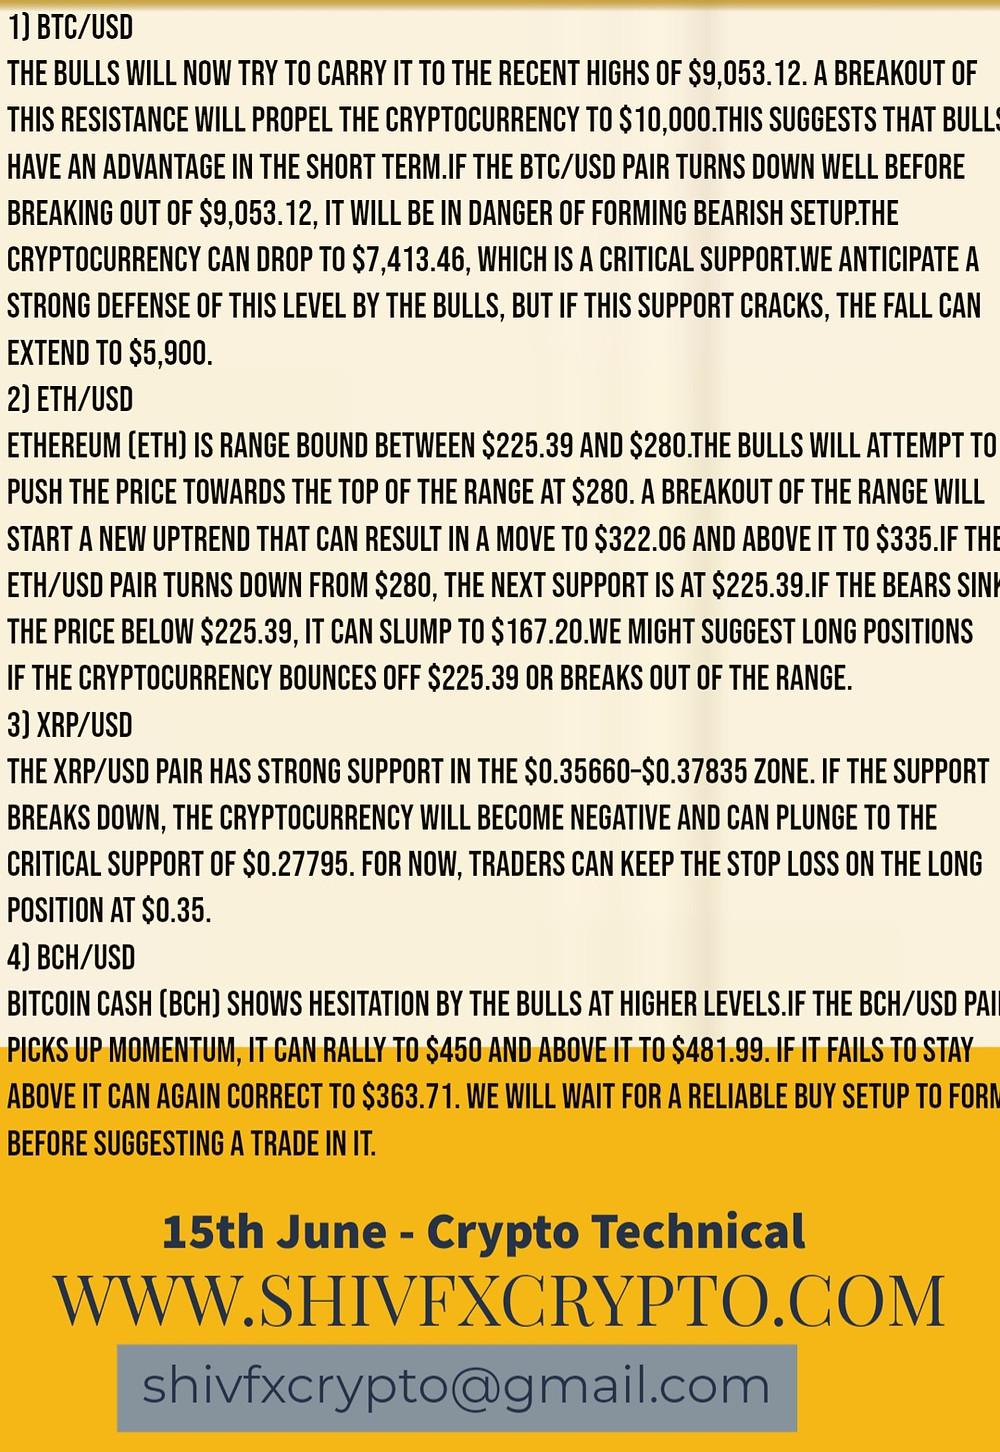 Crypto Technical & Market Updates